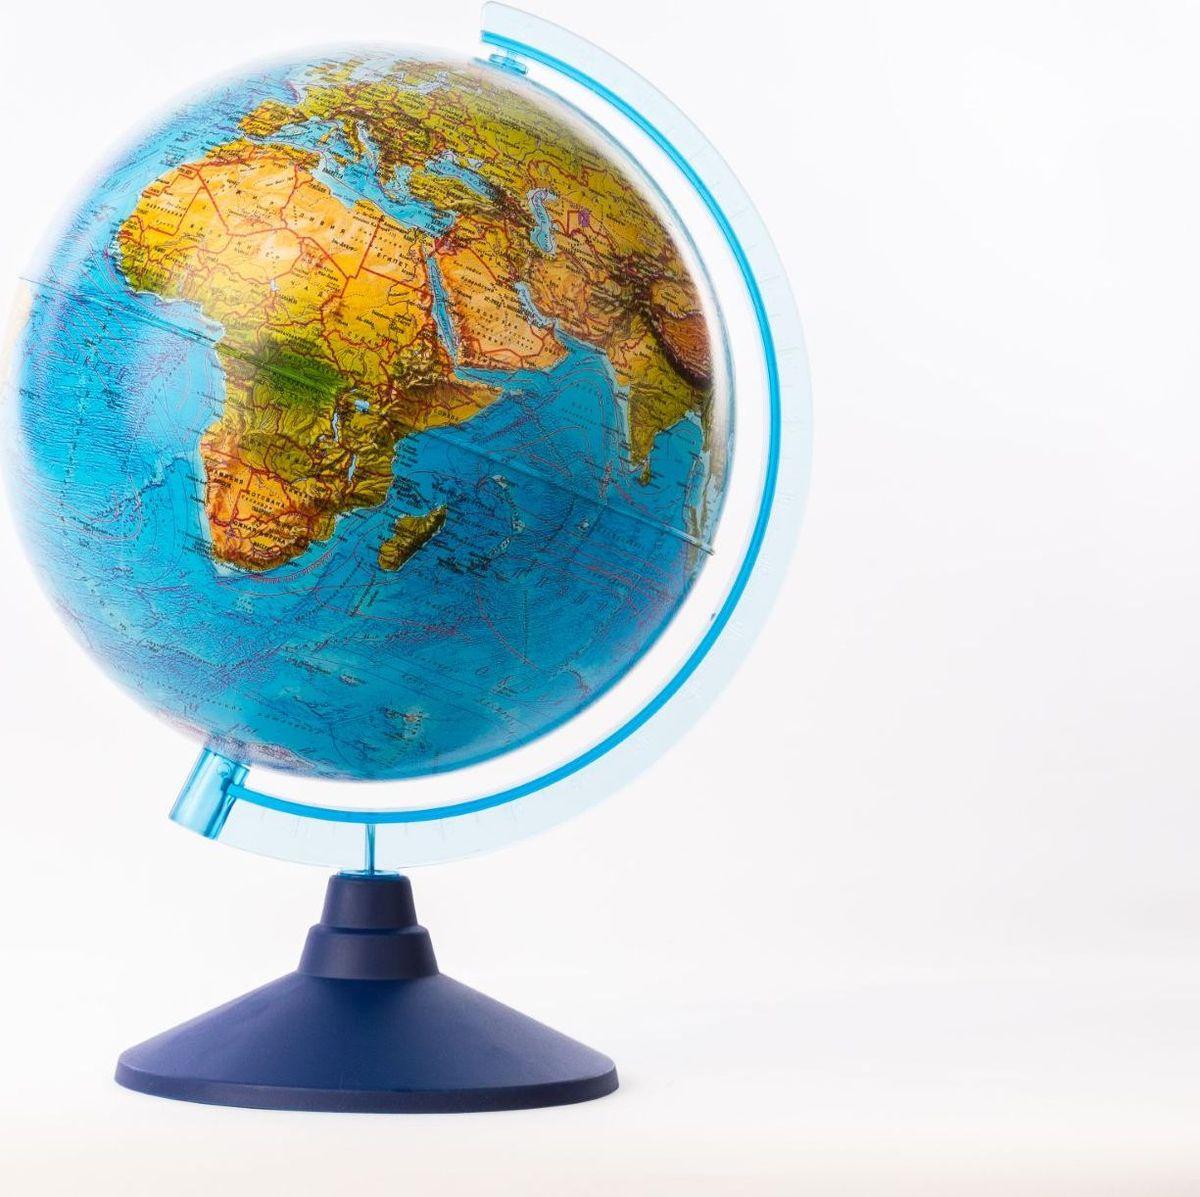 Глобен Глобус ландшафтный Классик Евро диаметр 25 см1259385